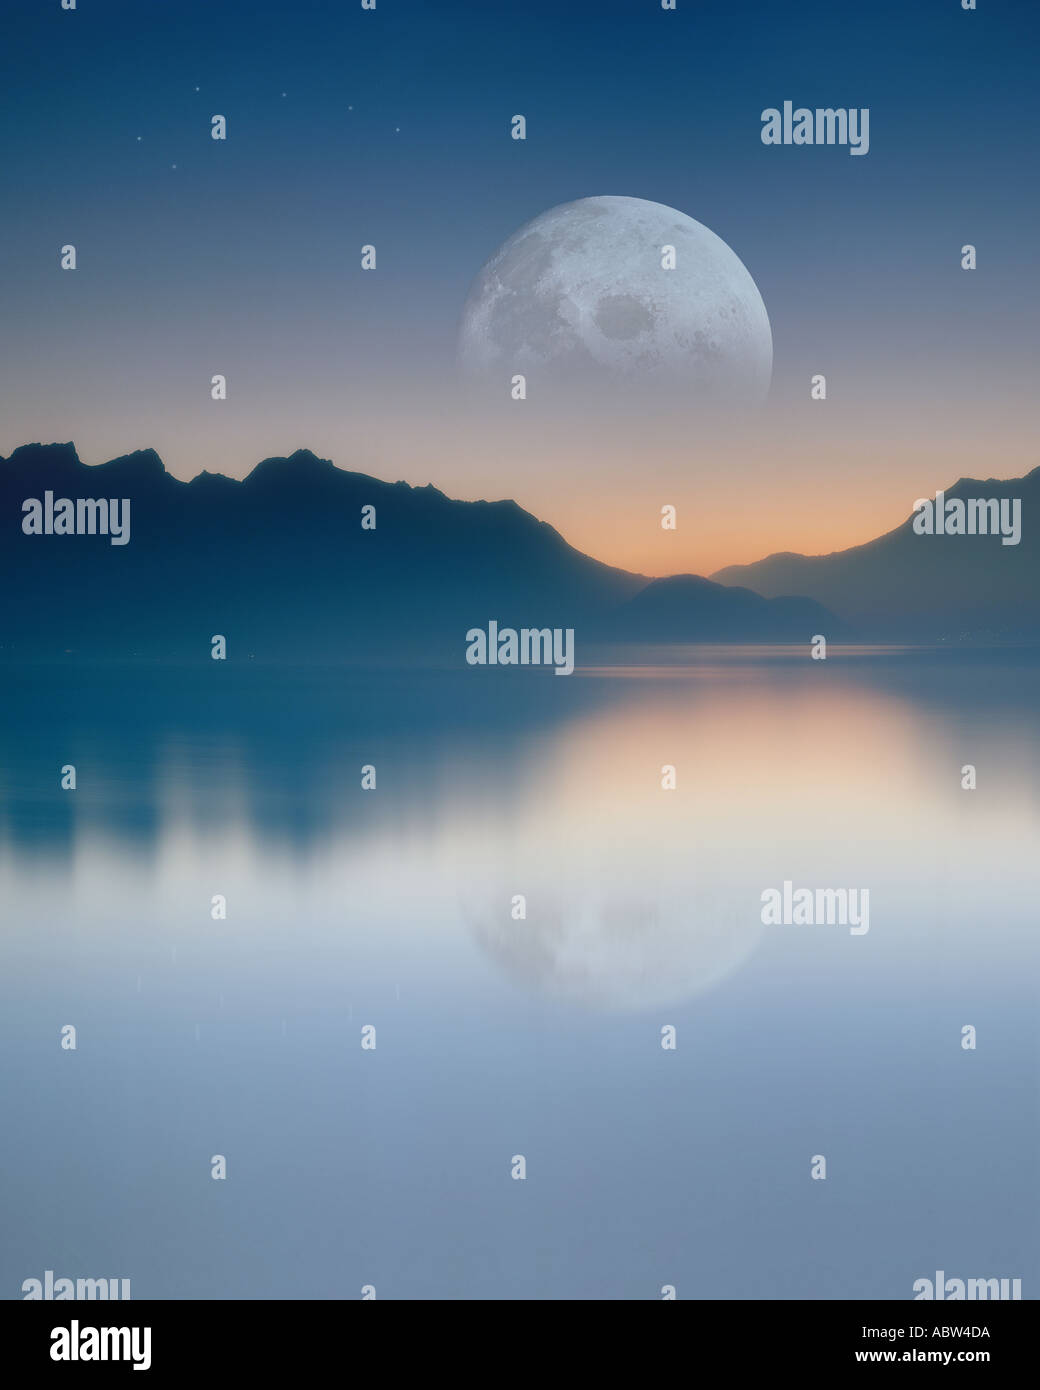 CH - Waadt: Mond über dem Genfer See Stockbild